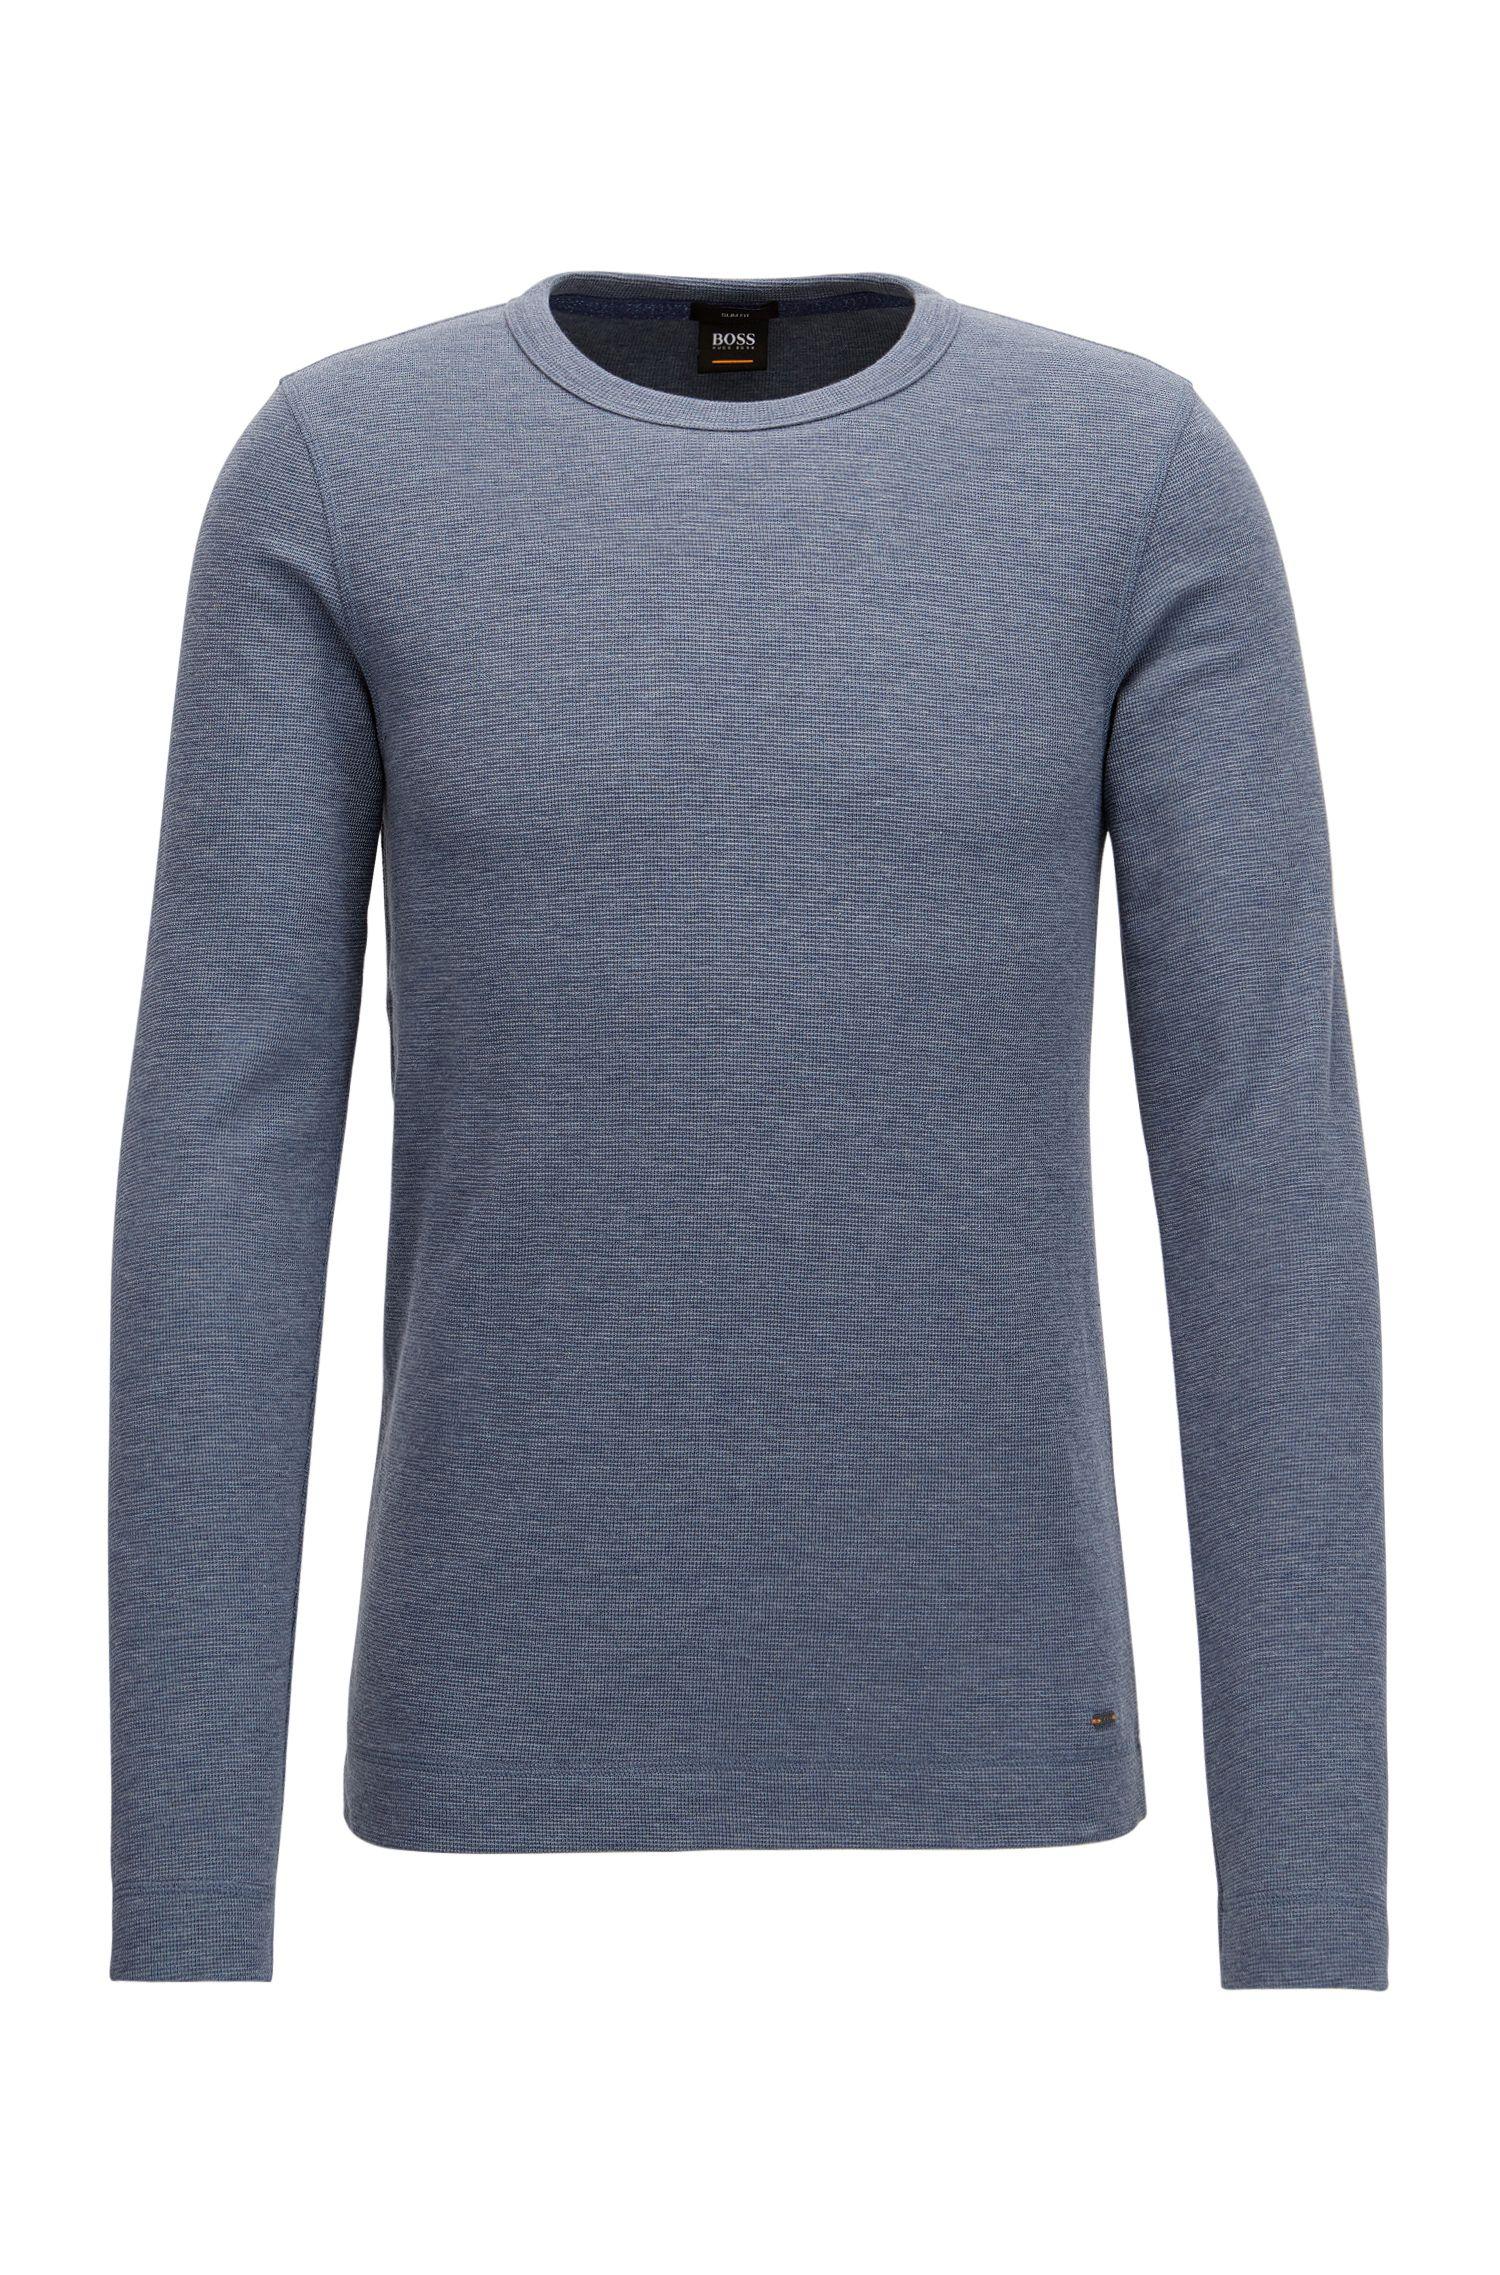 Slim-fit T-shirt van gemêleerde katoen met lange mouwen